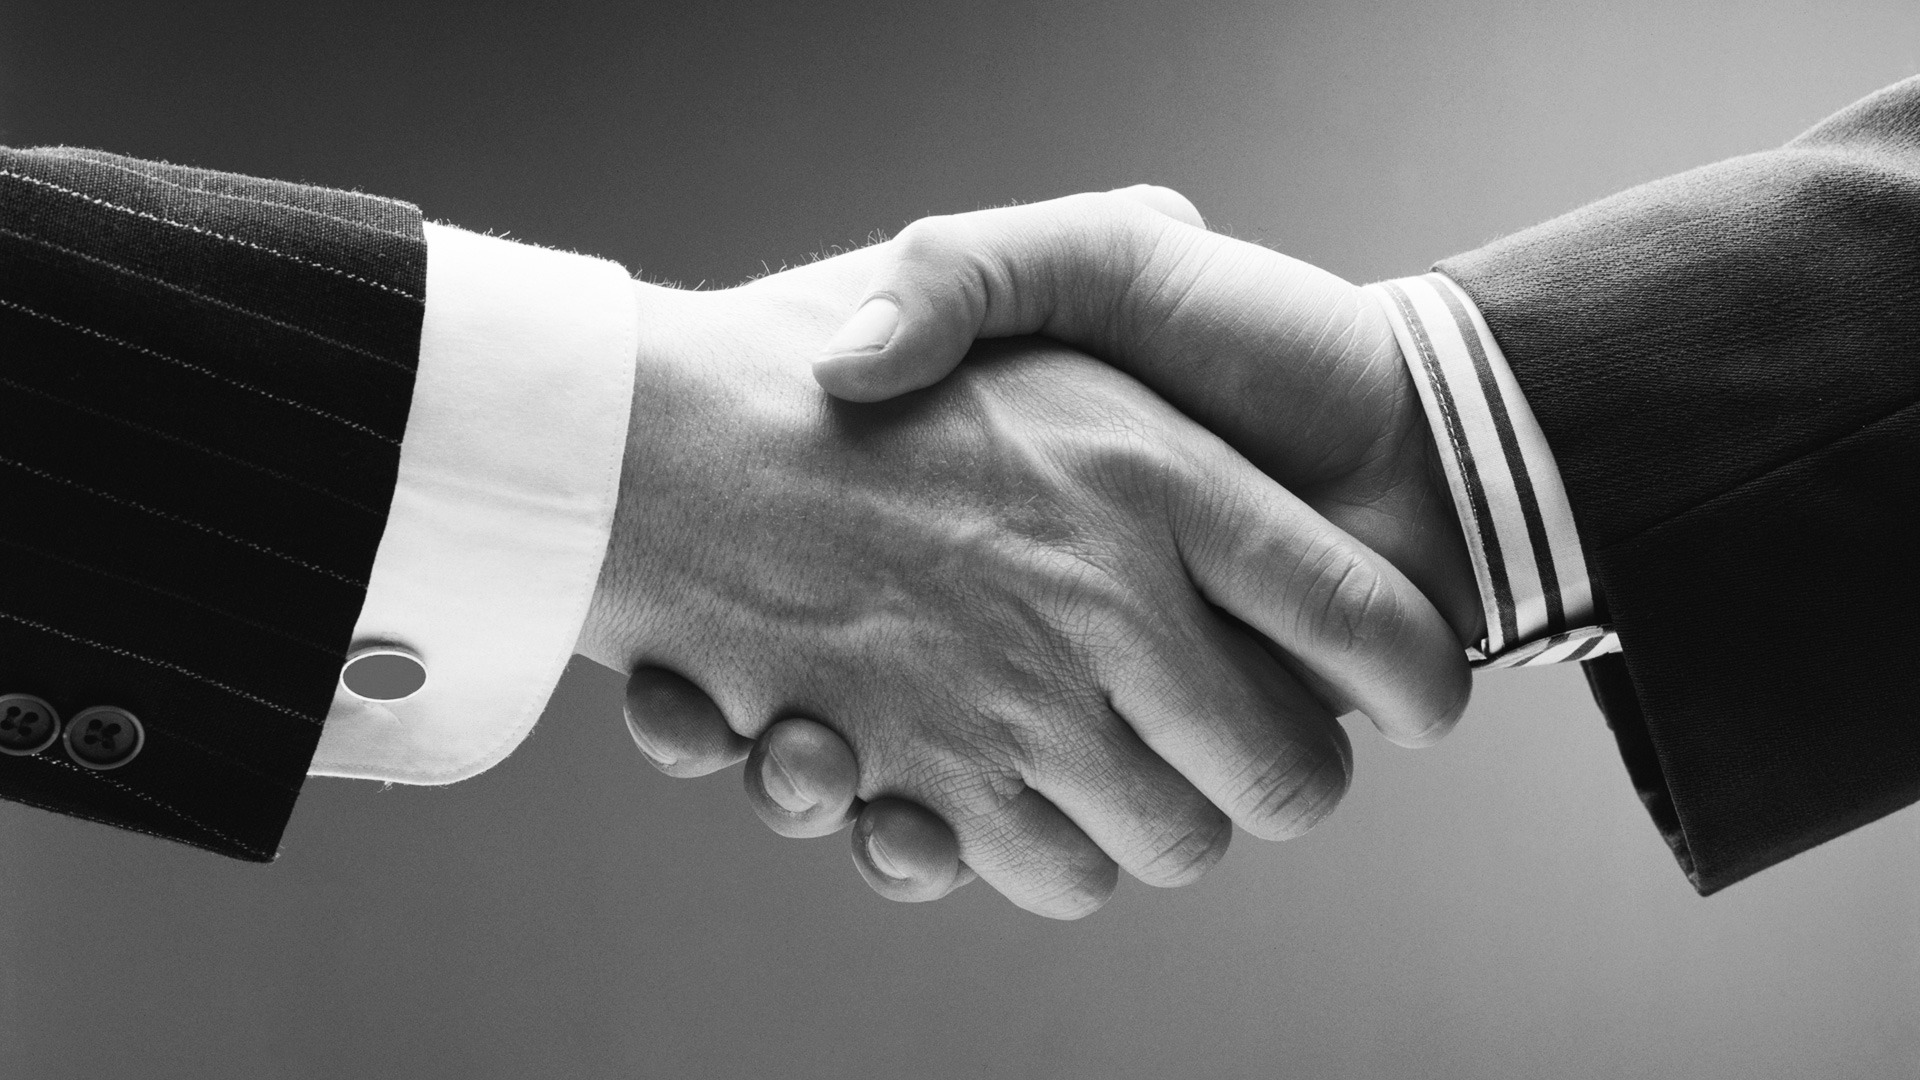 Partnership with Readunit